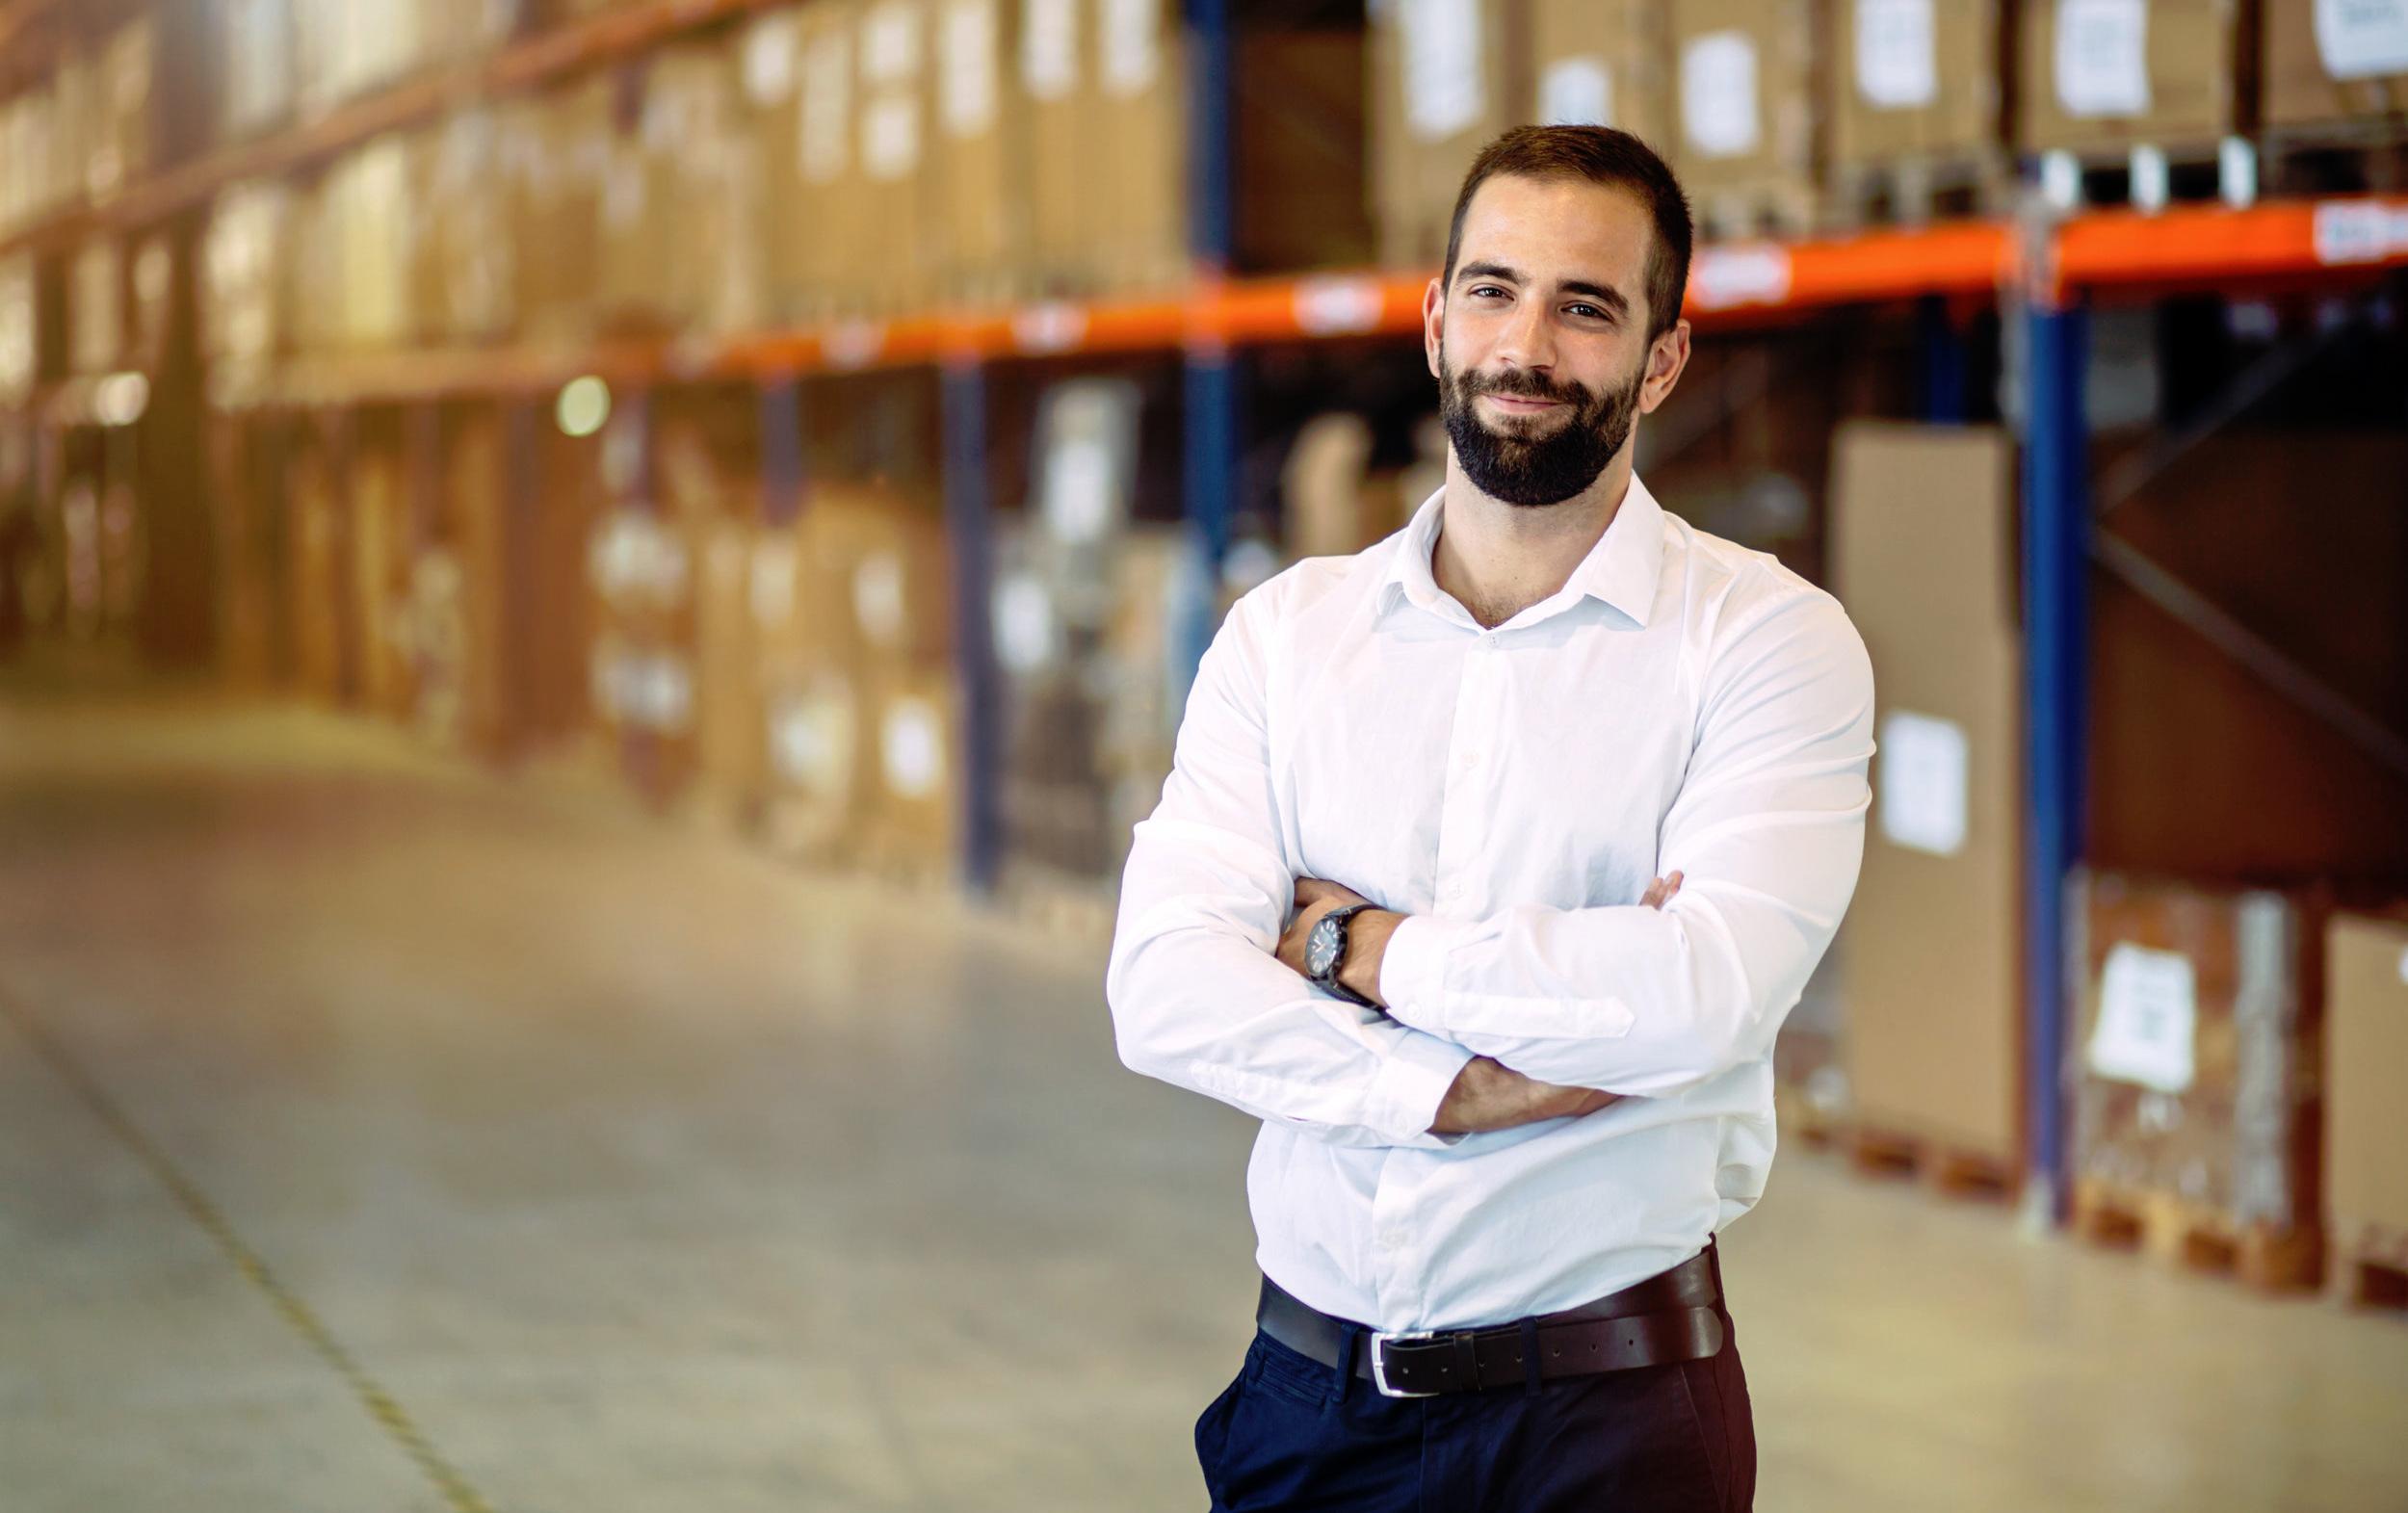 Canva+-+Logistics+manager+warehouse+portrait.jpg